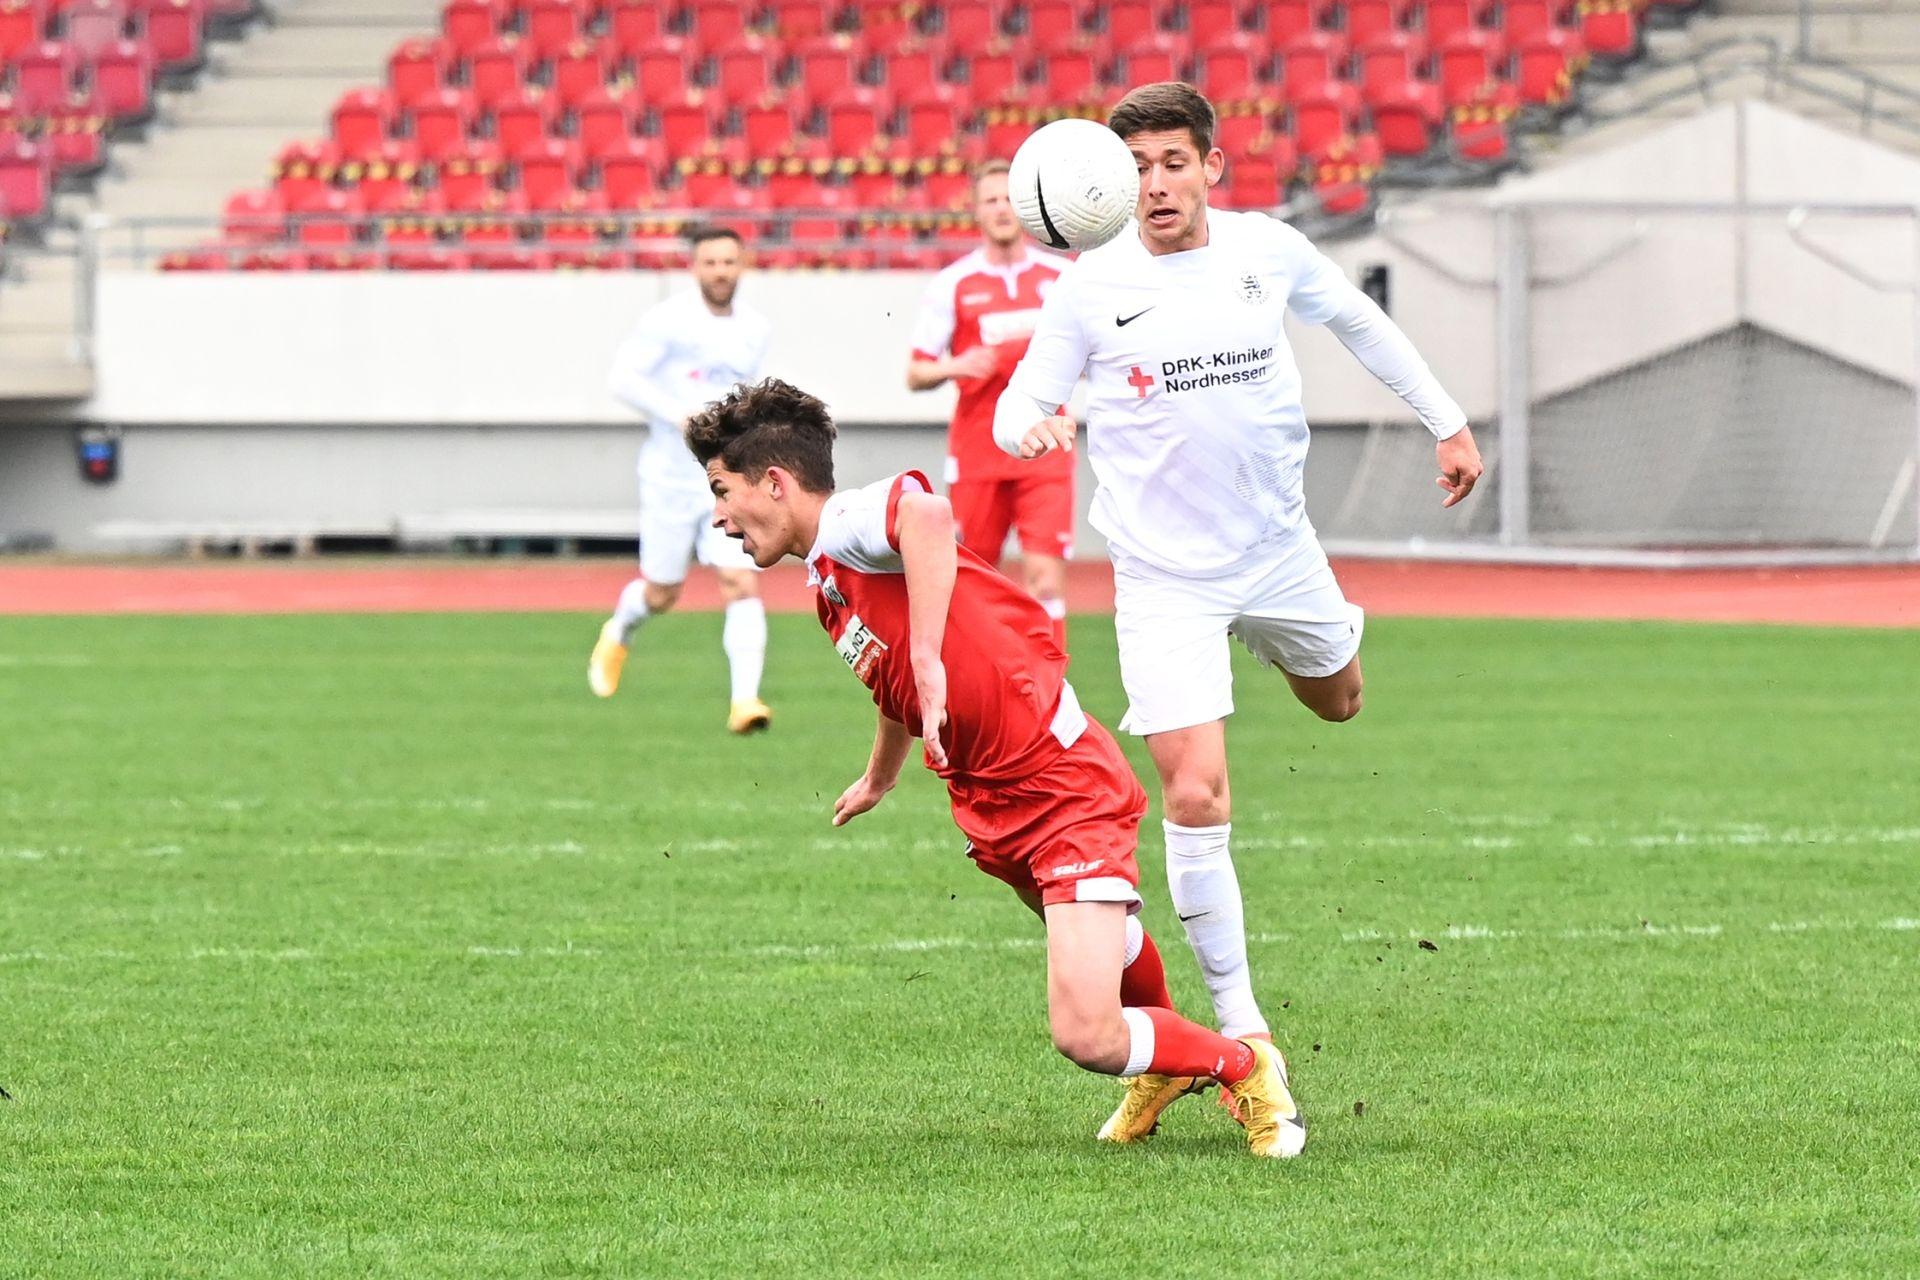 Regionalliga Südwest 2020/21, KSV Hessen Kassel, VfR Aalen, Endstand 1:1, Serkan Durna